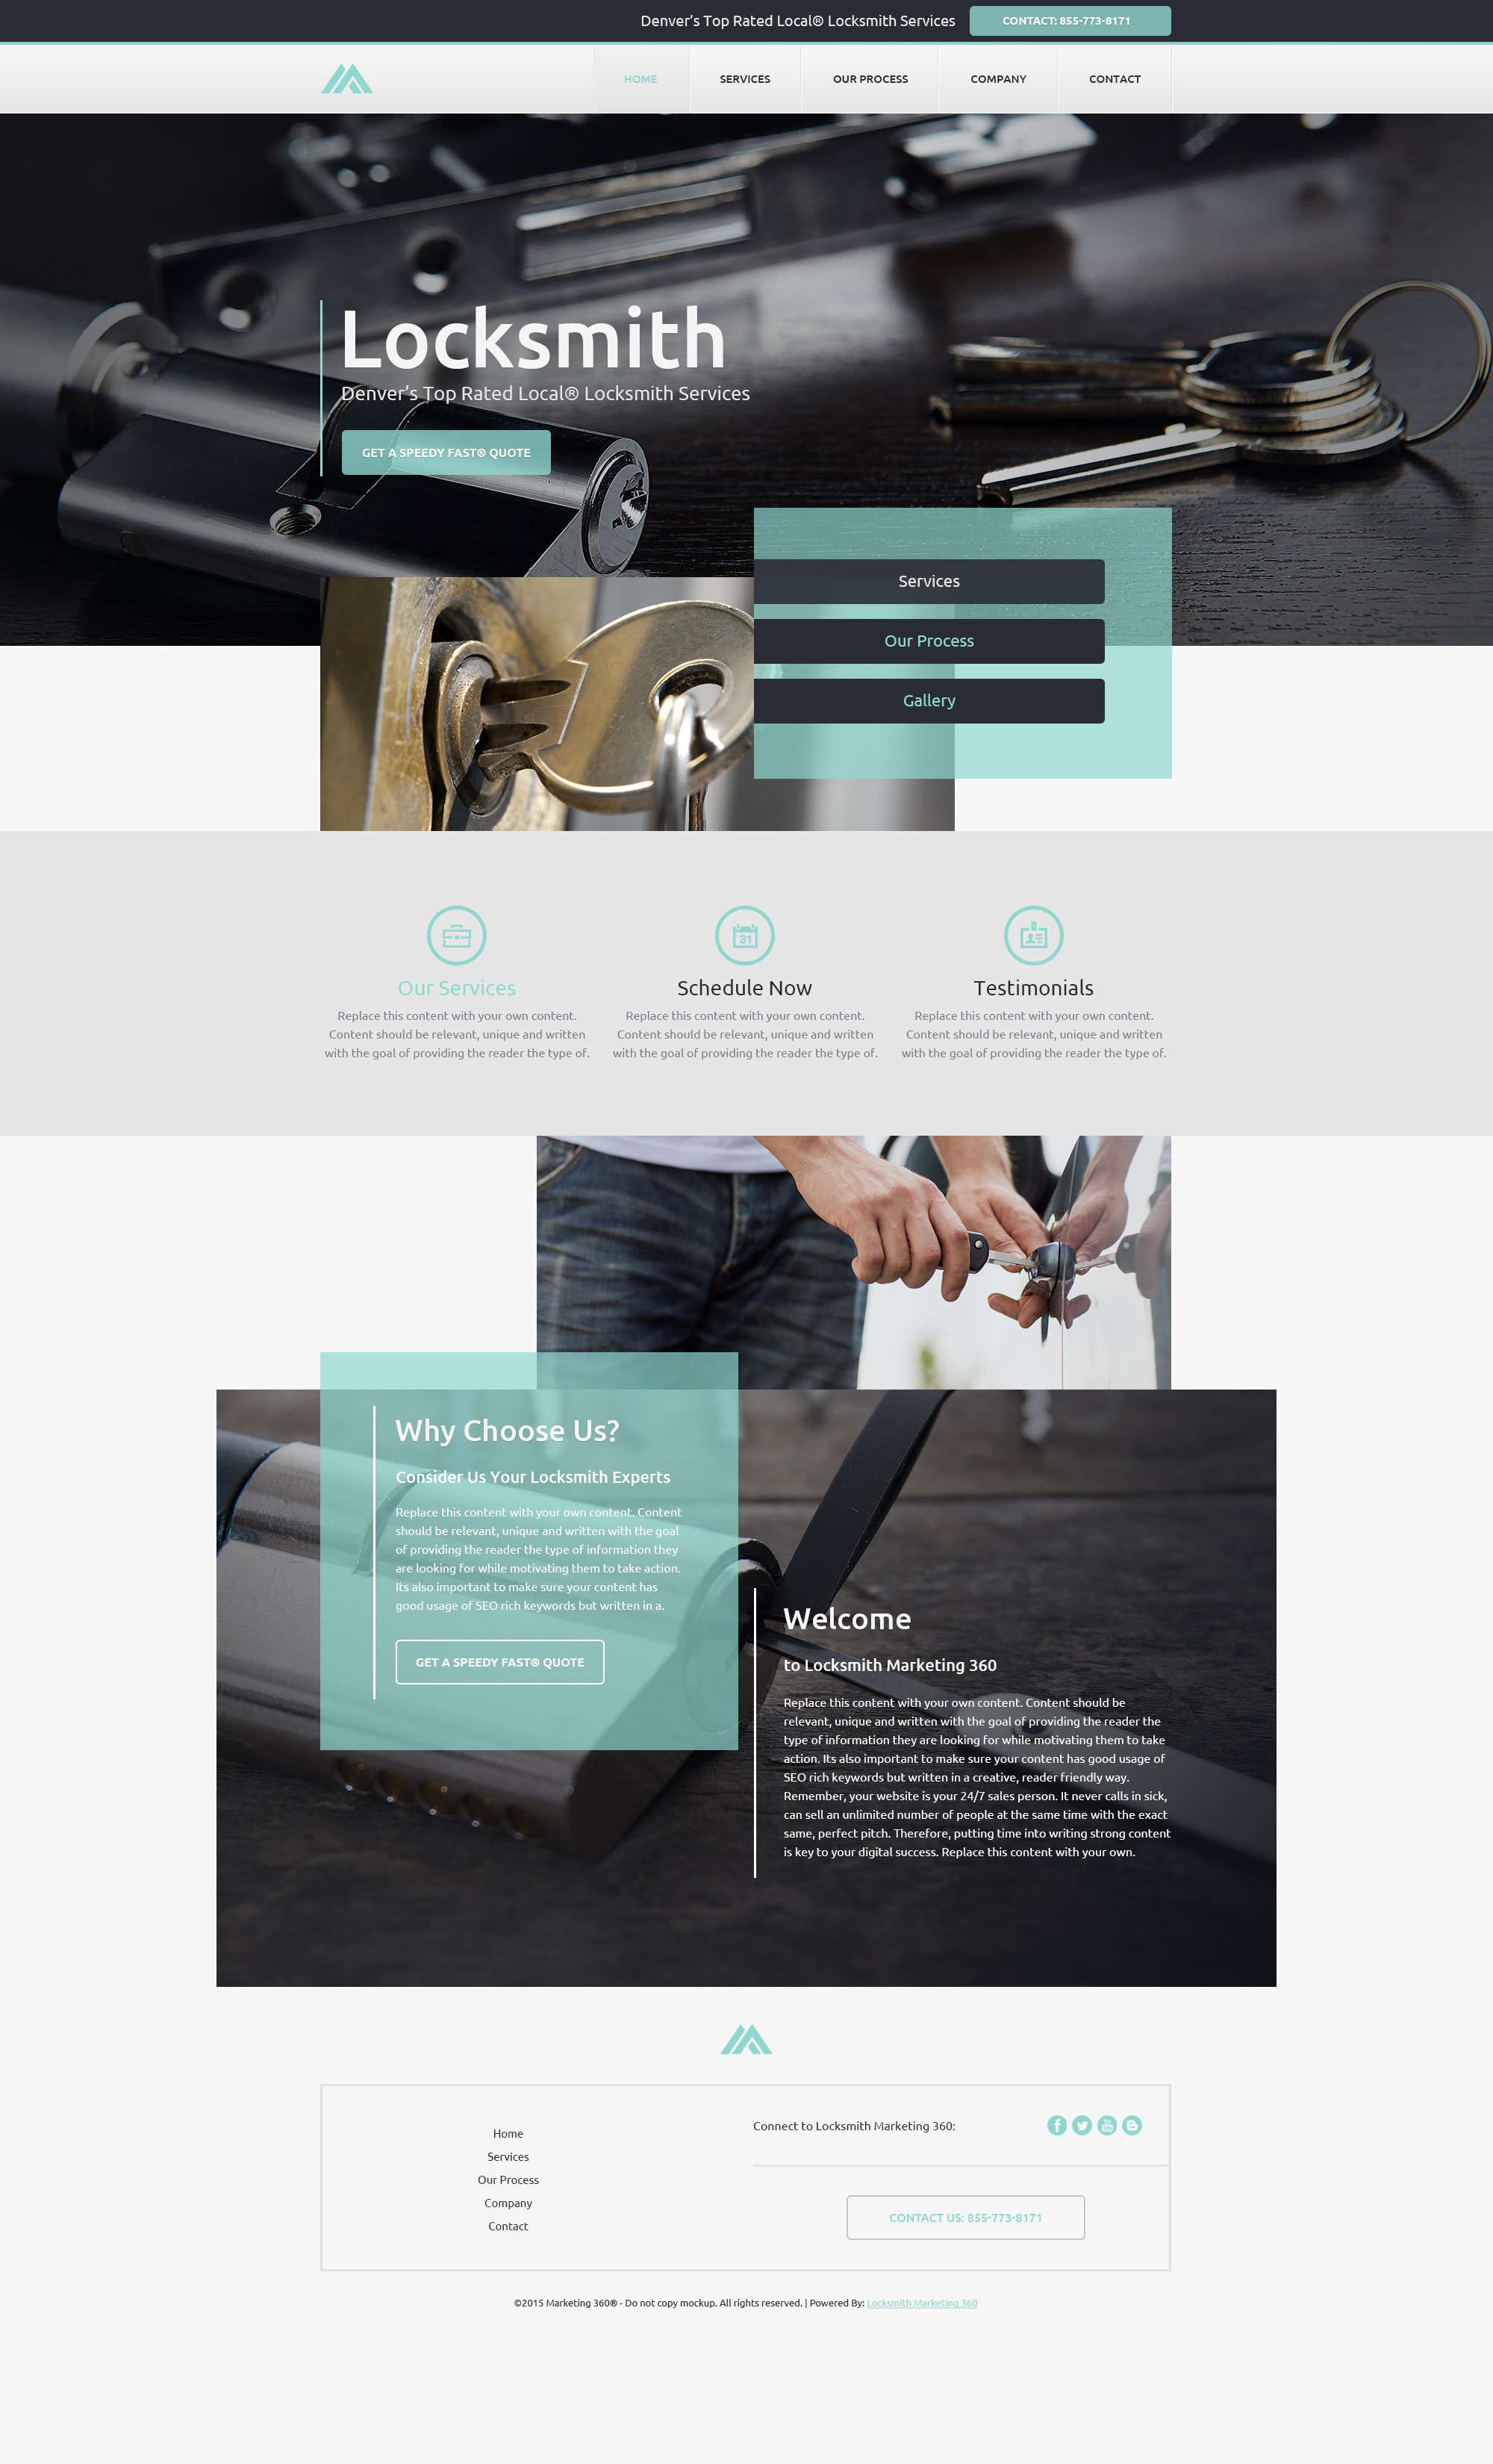 locksmith logos templates. Your Dream Site. Locksmith Logos Templates 7